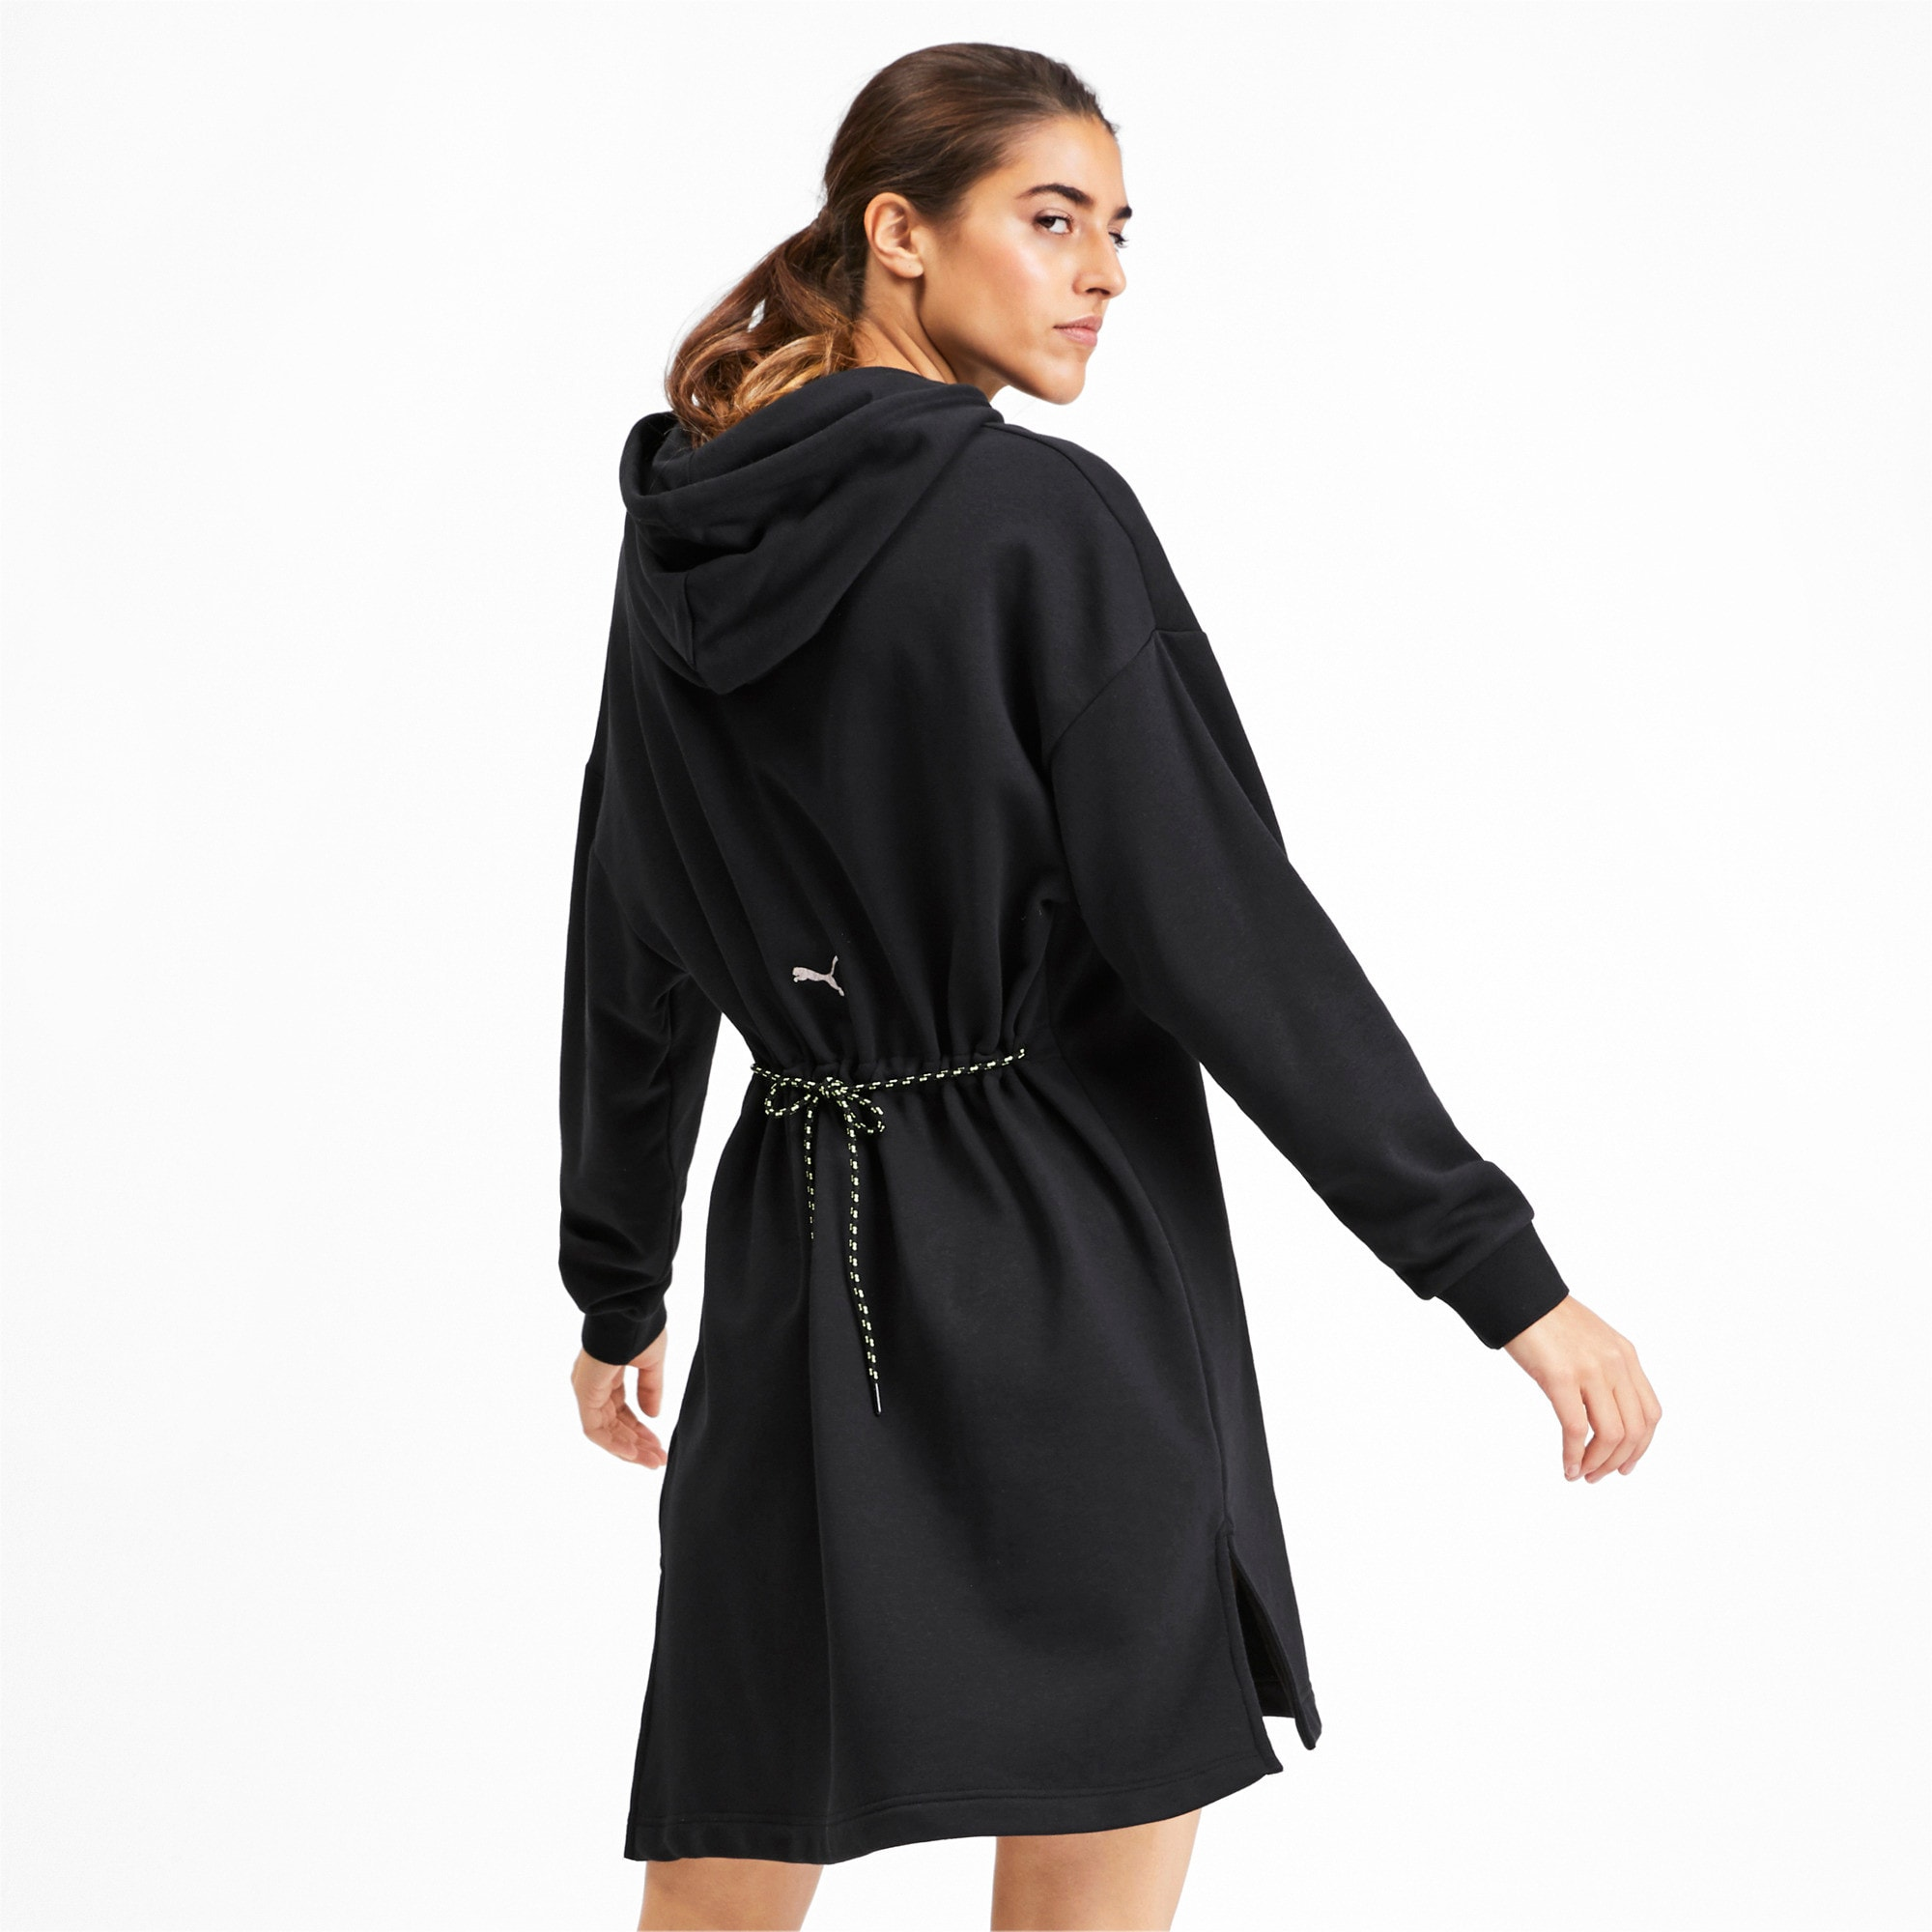 Thumbnail 2 of Chase Women's Hooded Dress, Puma Black, medium